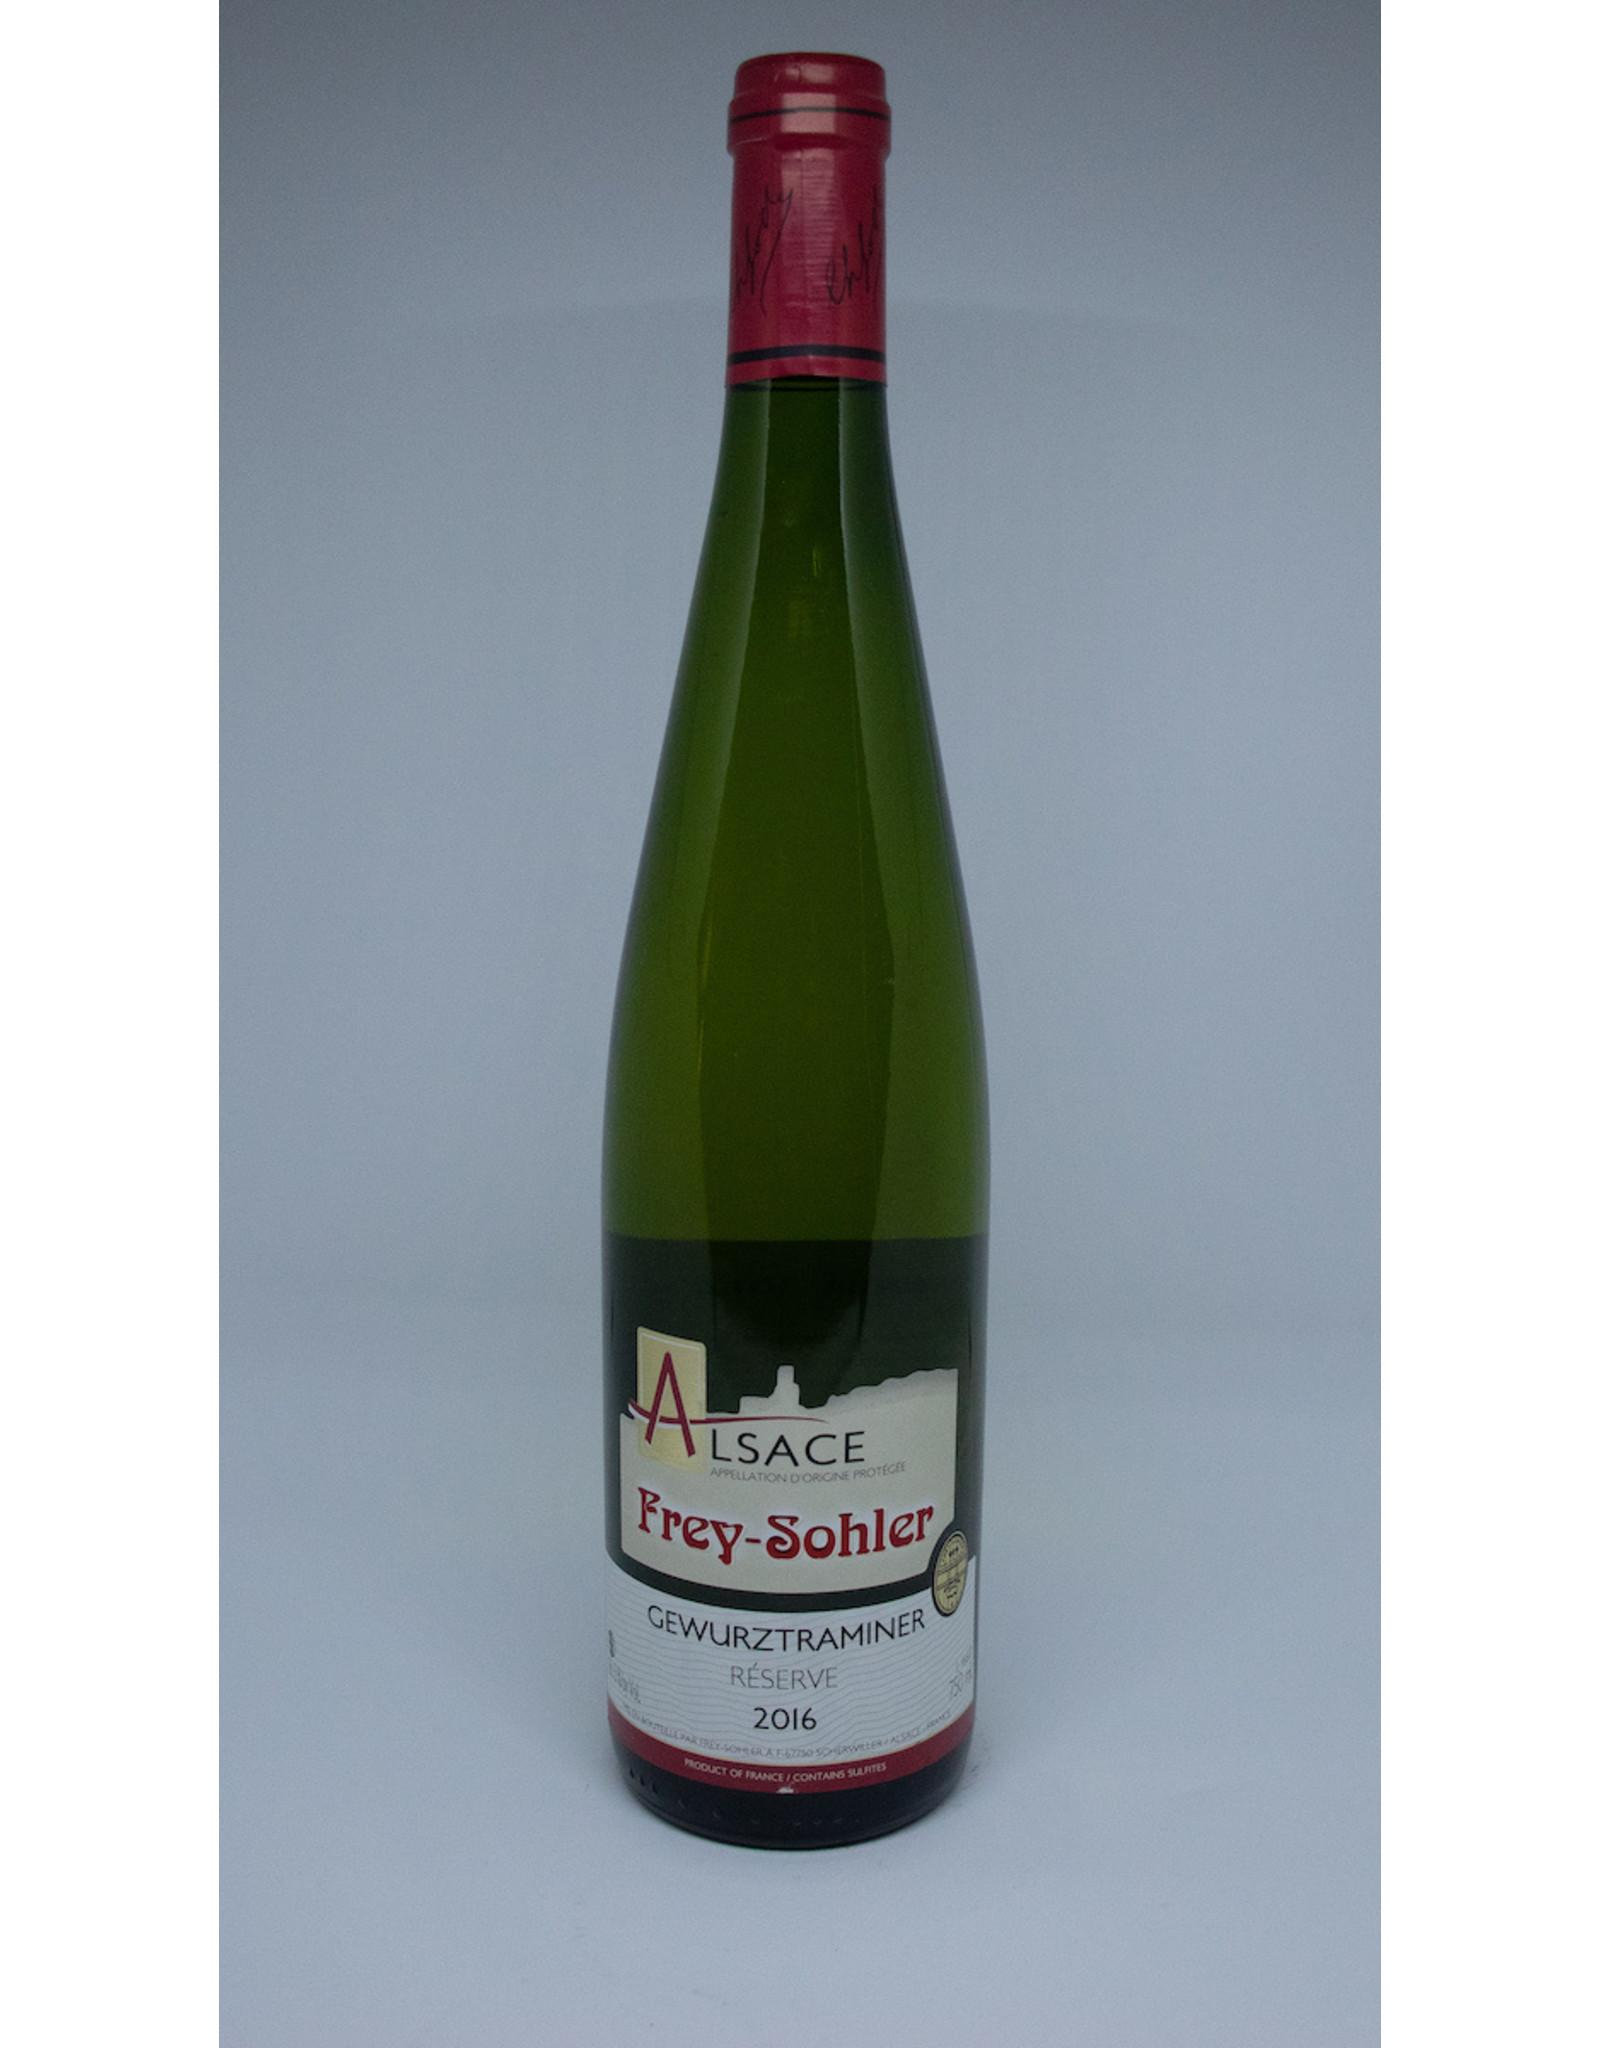 Frey-Solher Frey-Solher Gewürztraminer Reserve